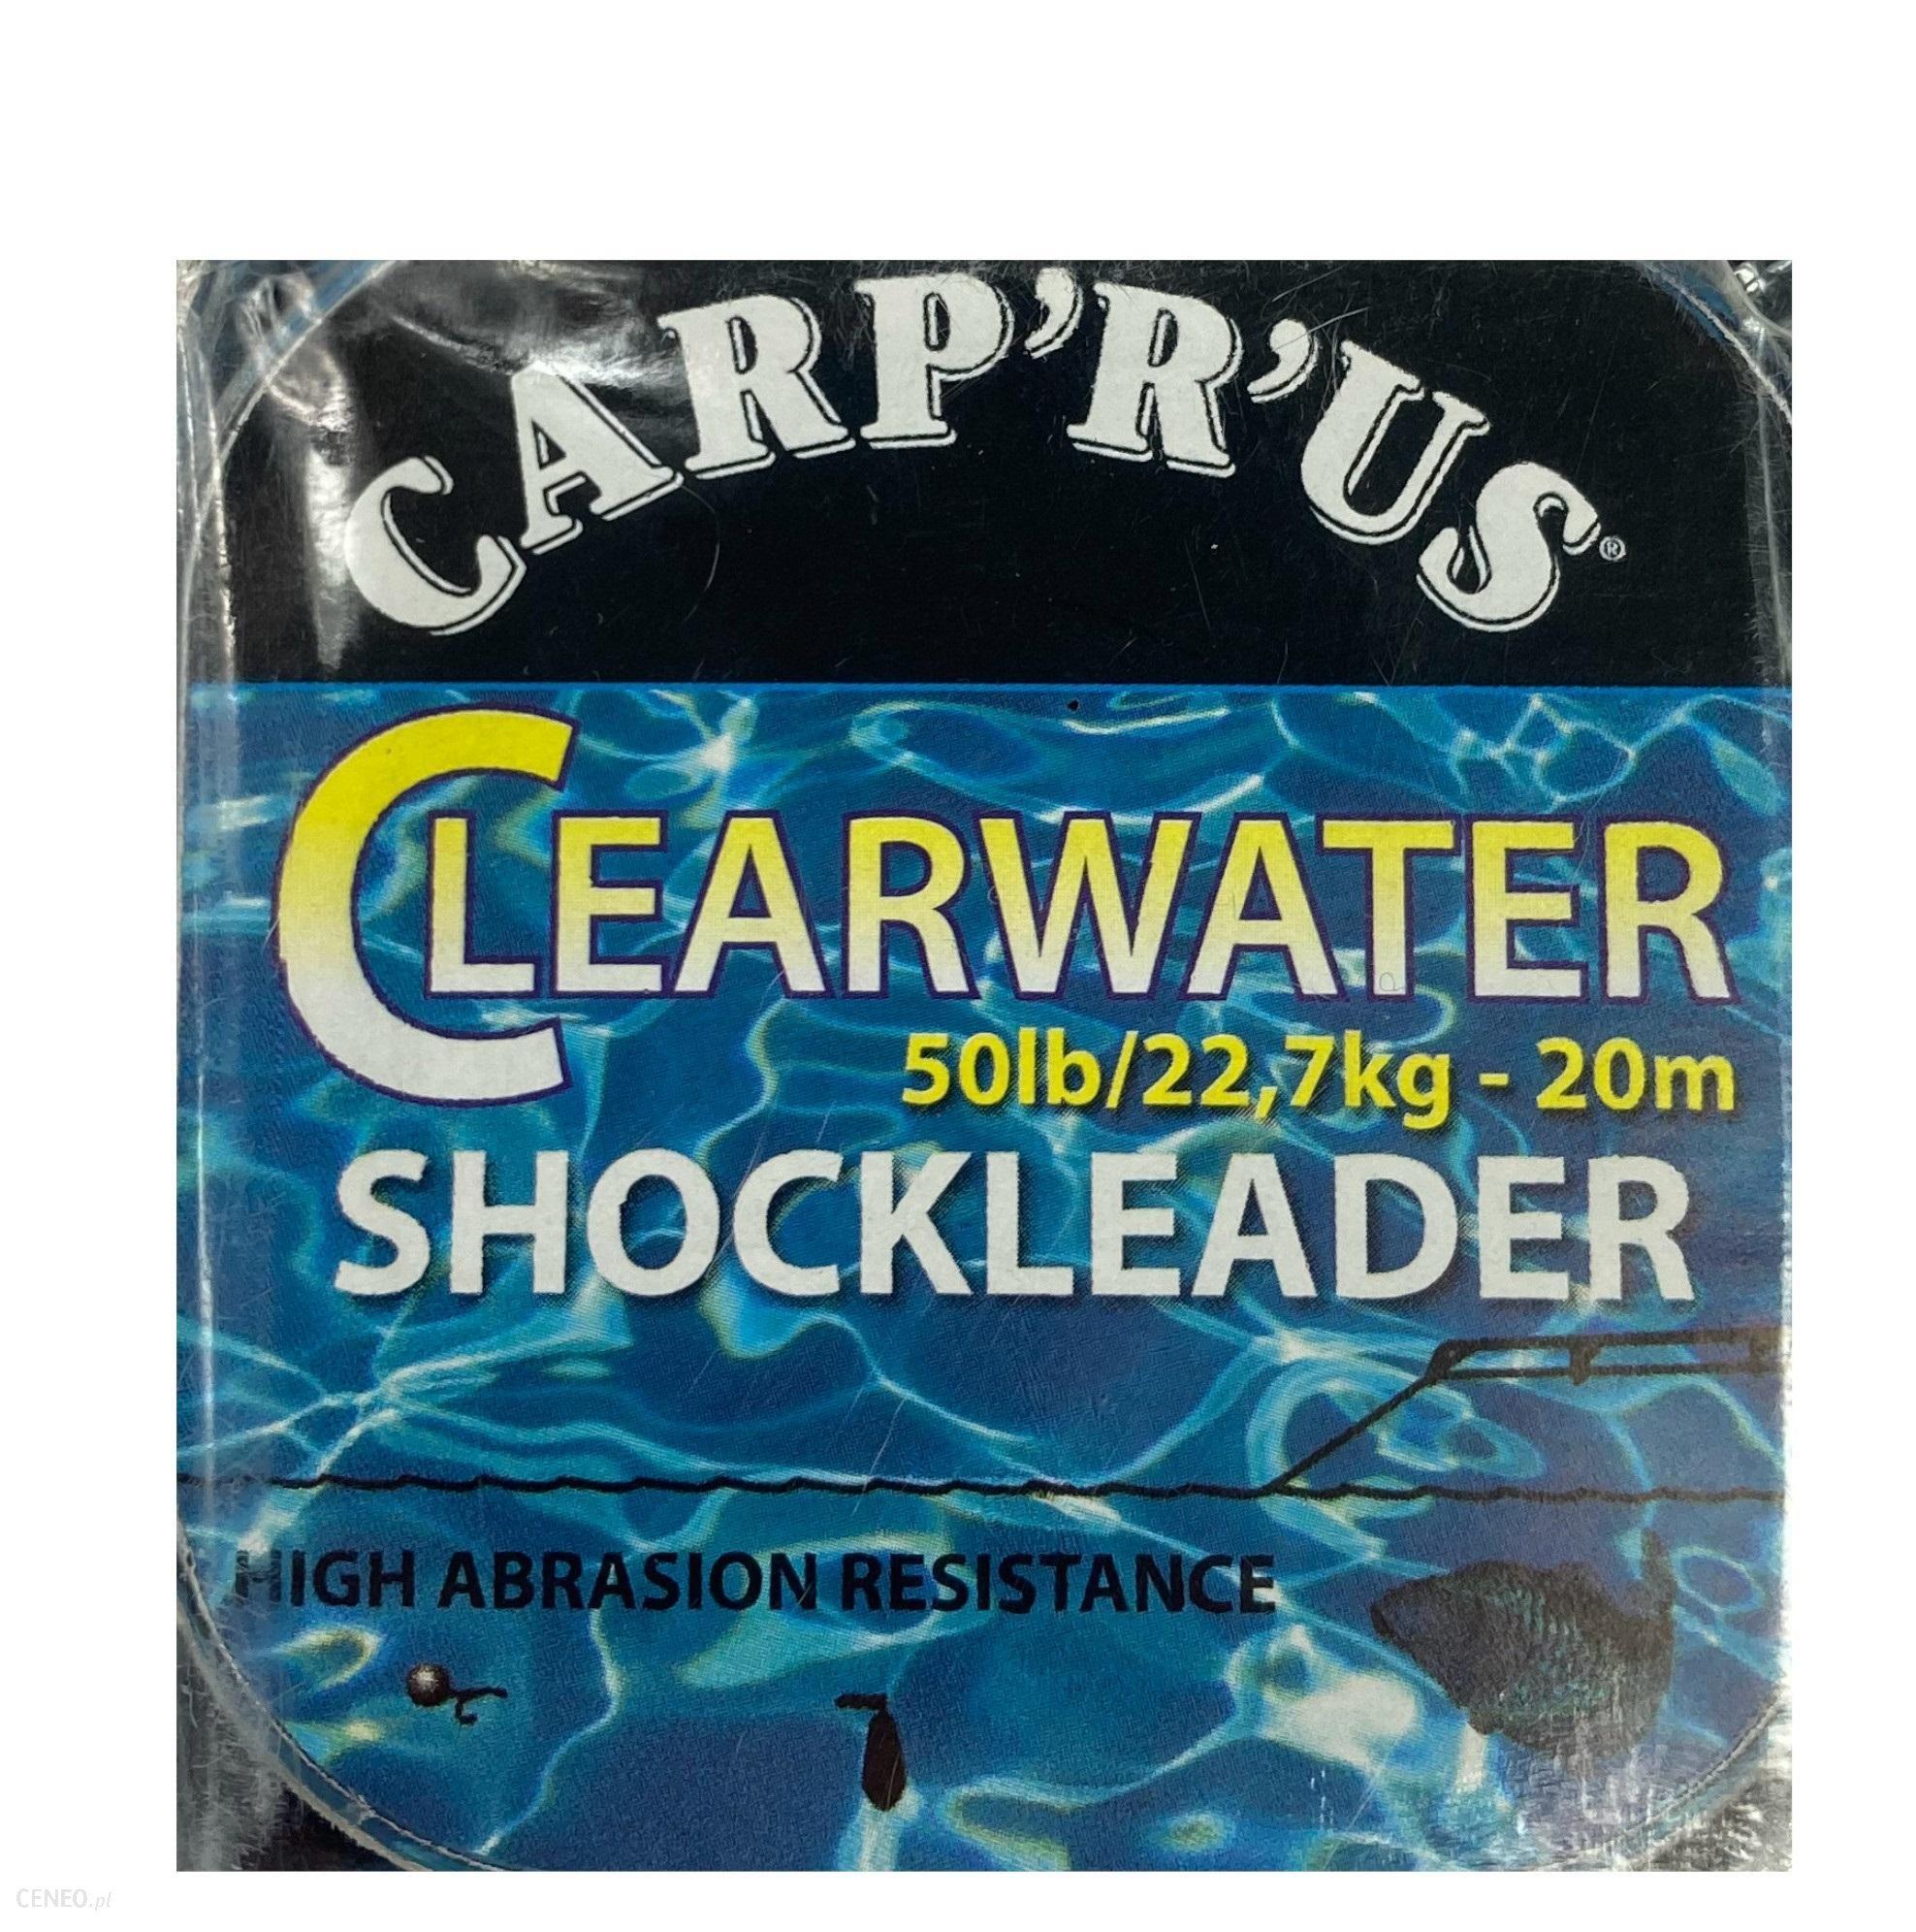 Carp'R'Us Clearwater Fluorocarbon 50Lb 20M